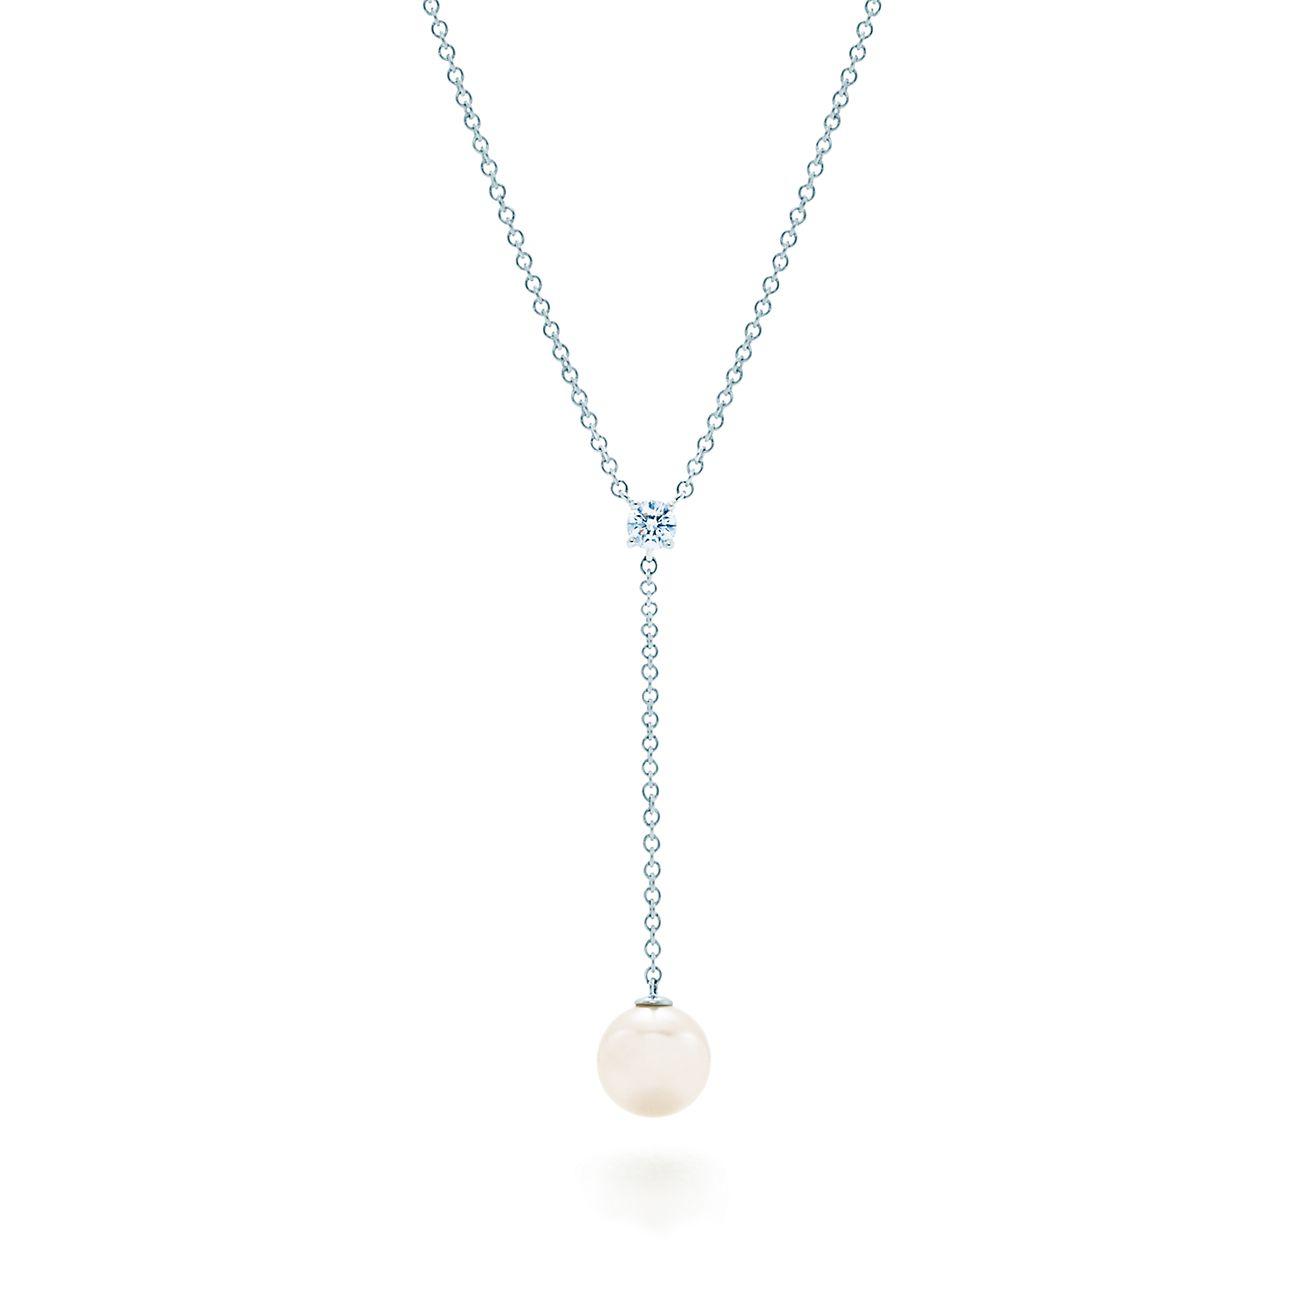 Tiffany Signature® Pearls Tropfenanhänger